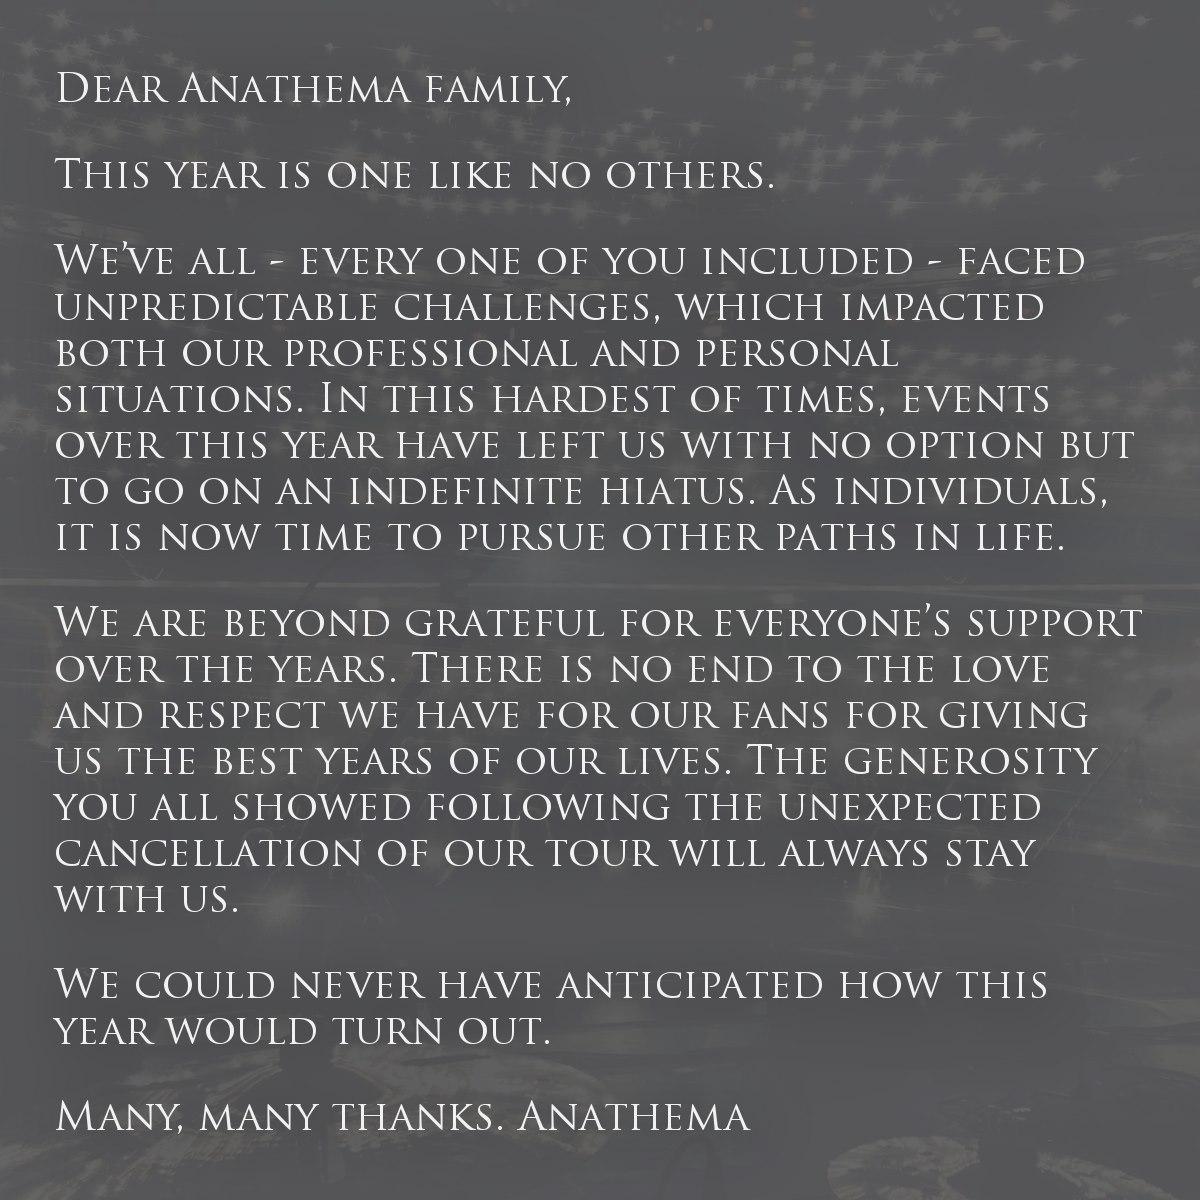 anathema done